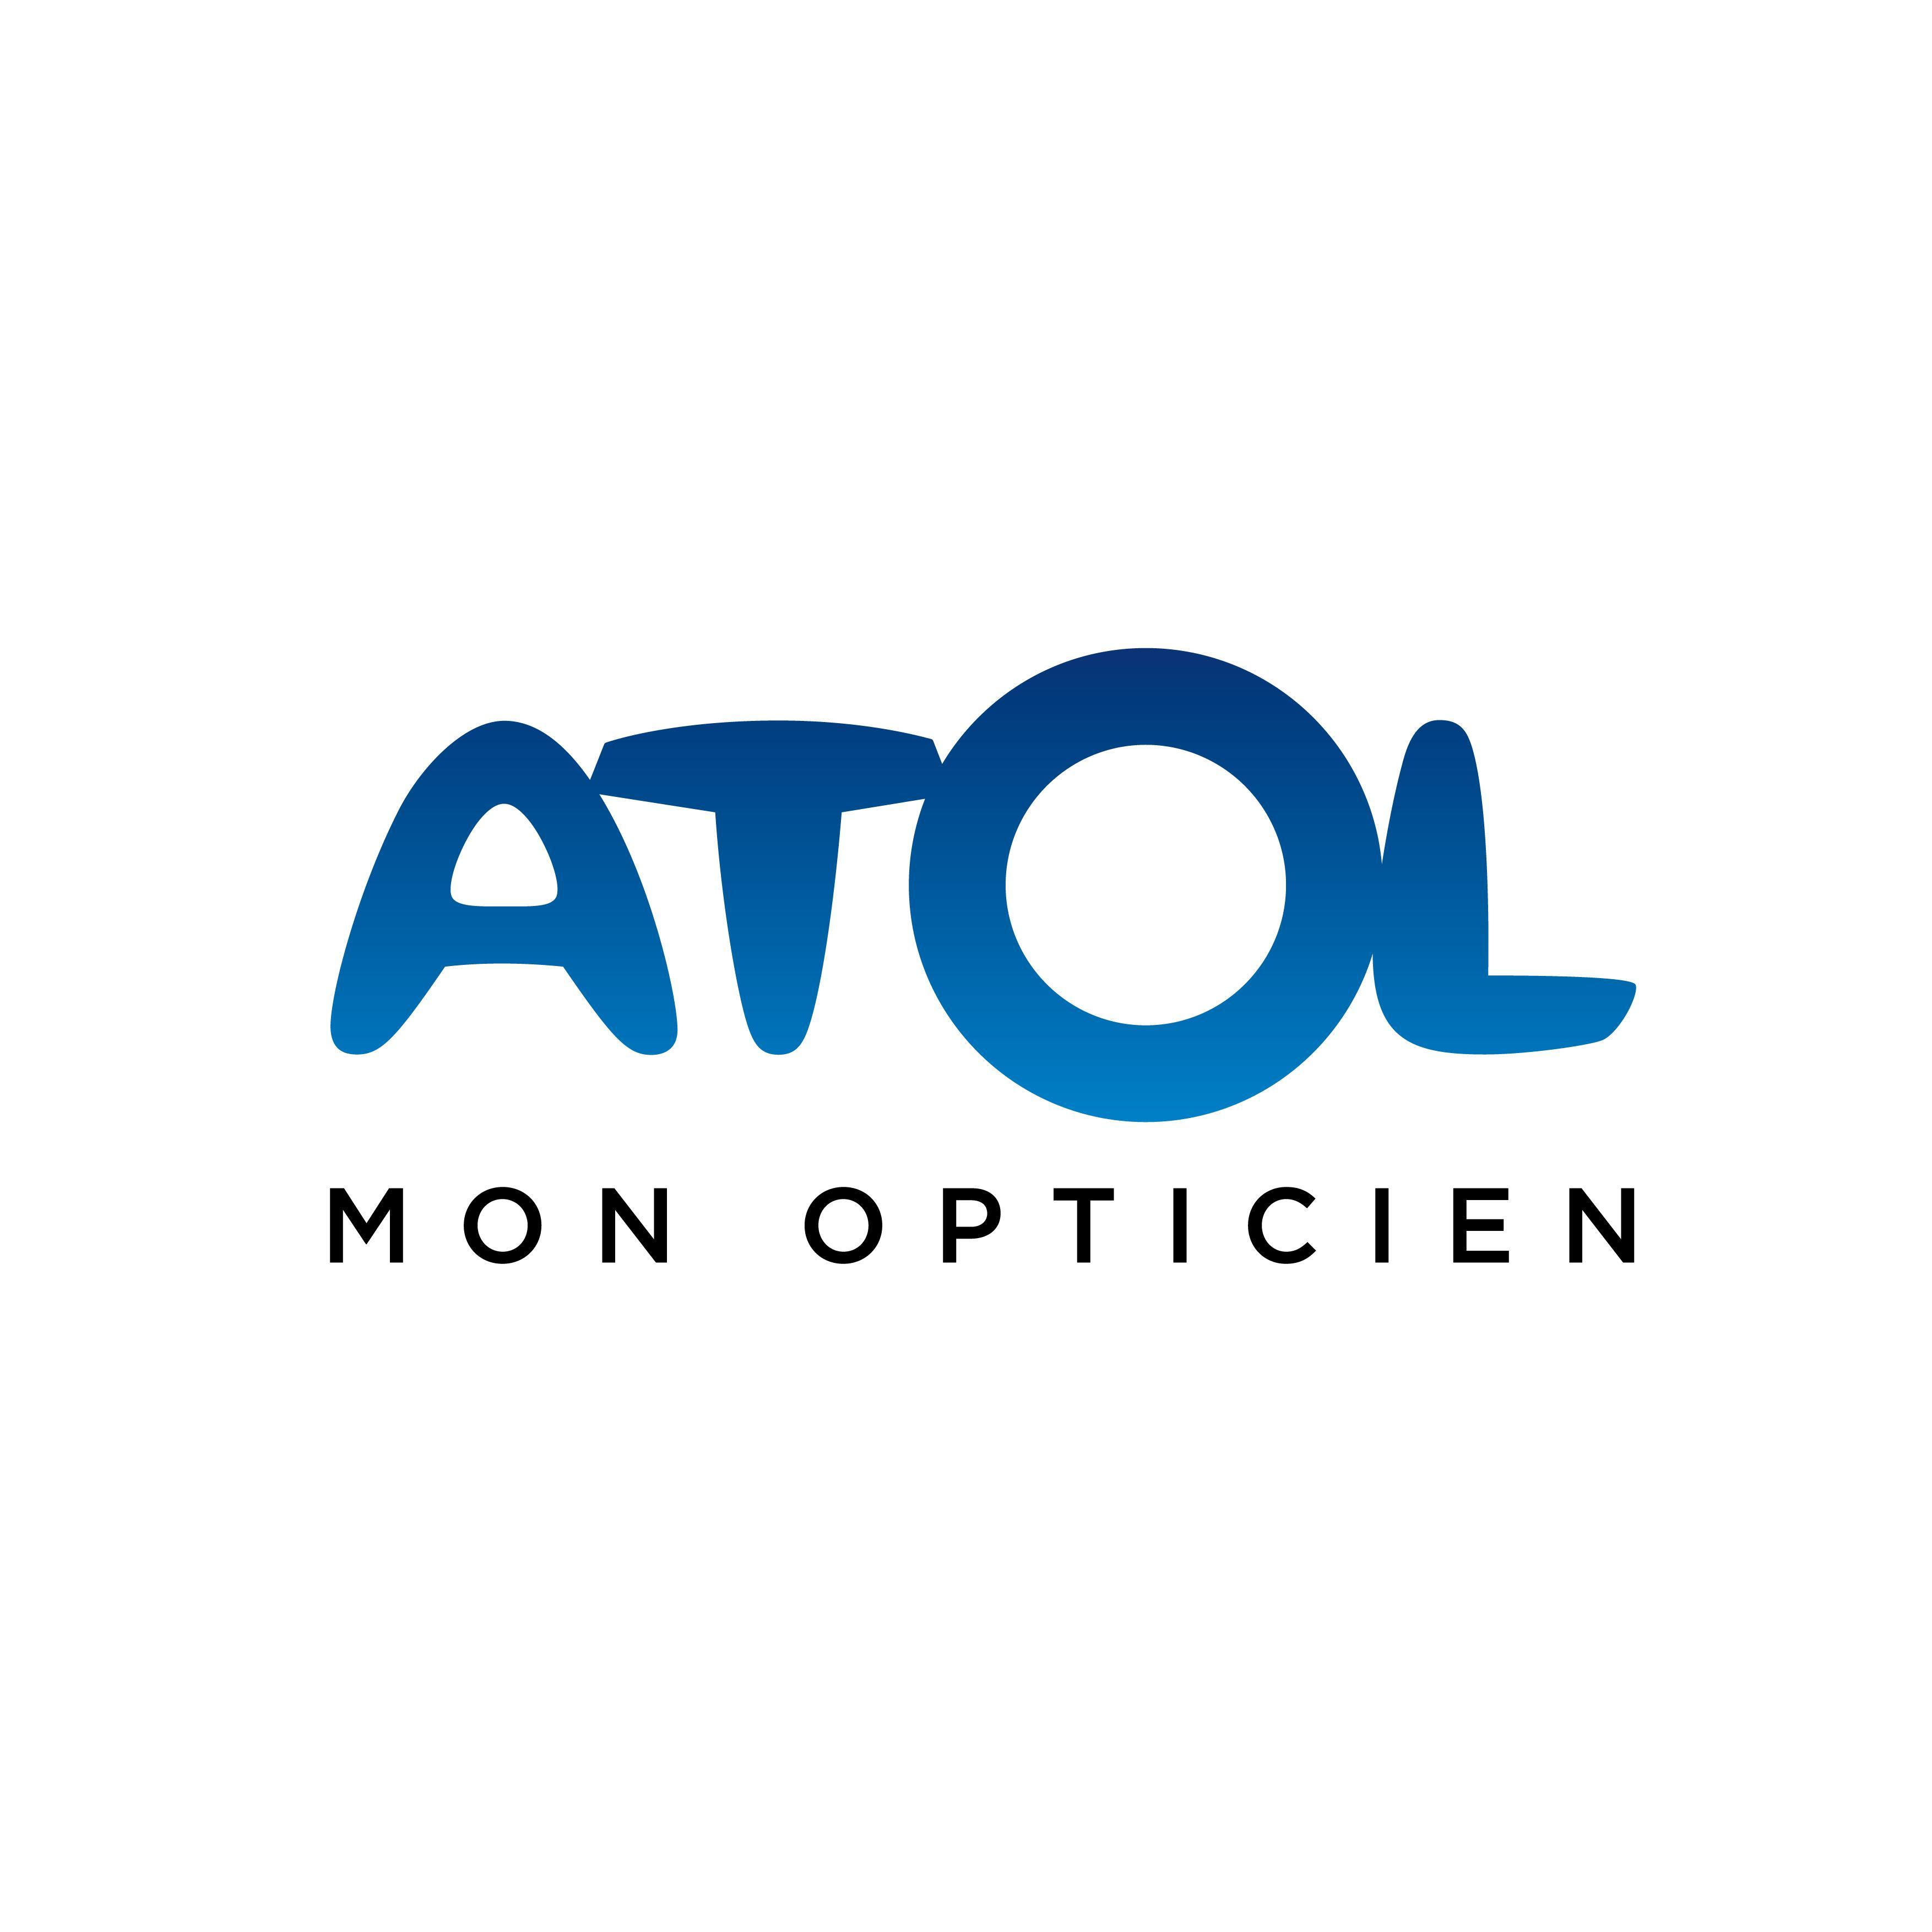 Atol Mon Opticien Amiens